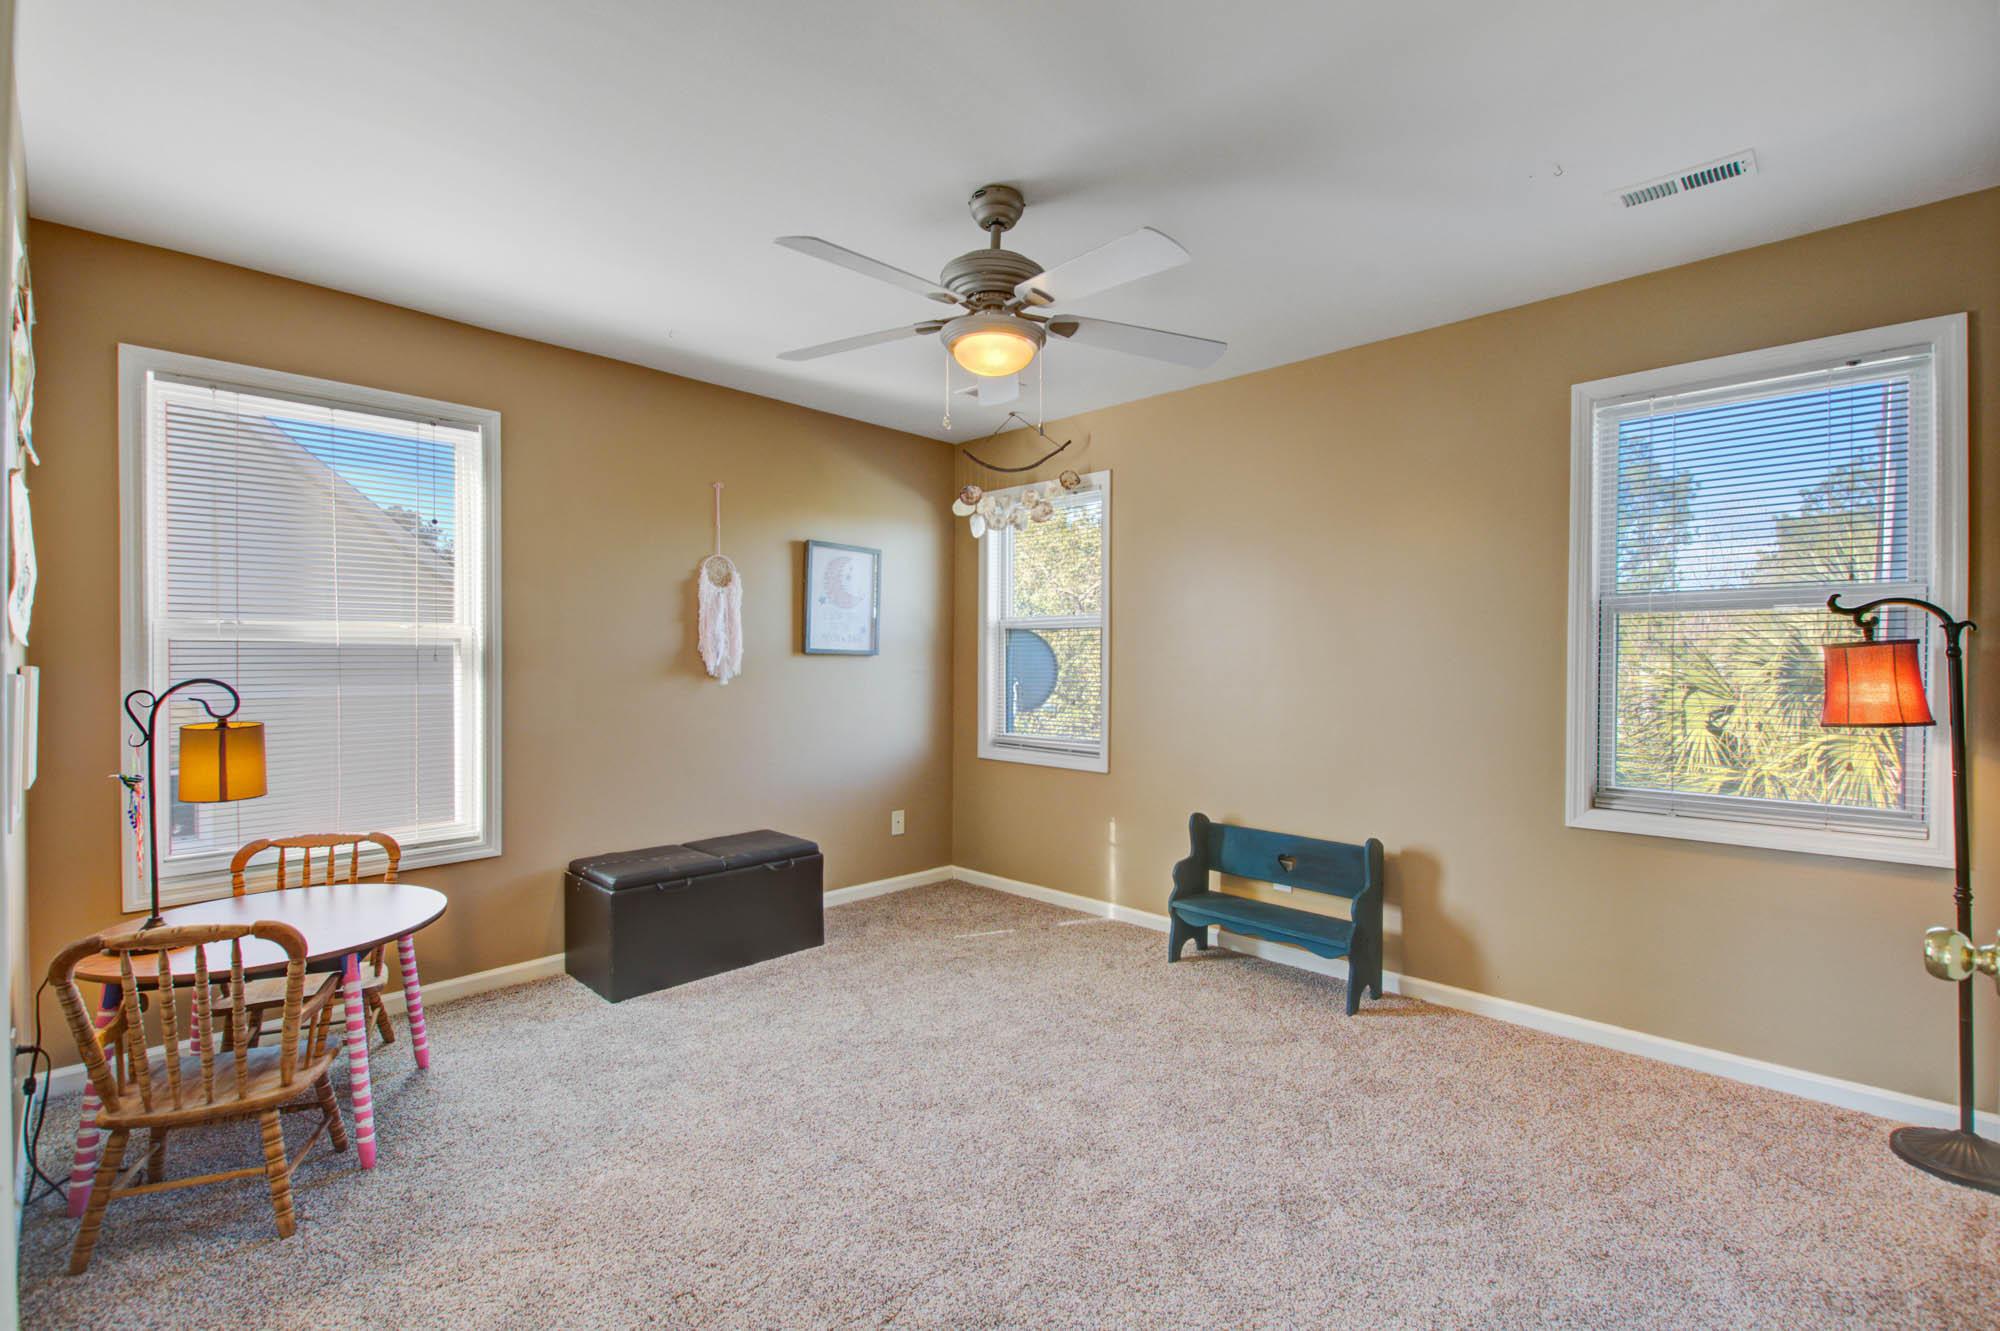 St Thomas Point Homes For Sale - 307 Jamesbury, Charleston, SC - 15